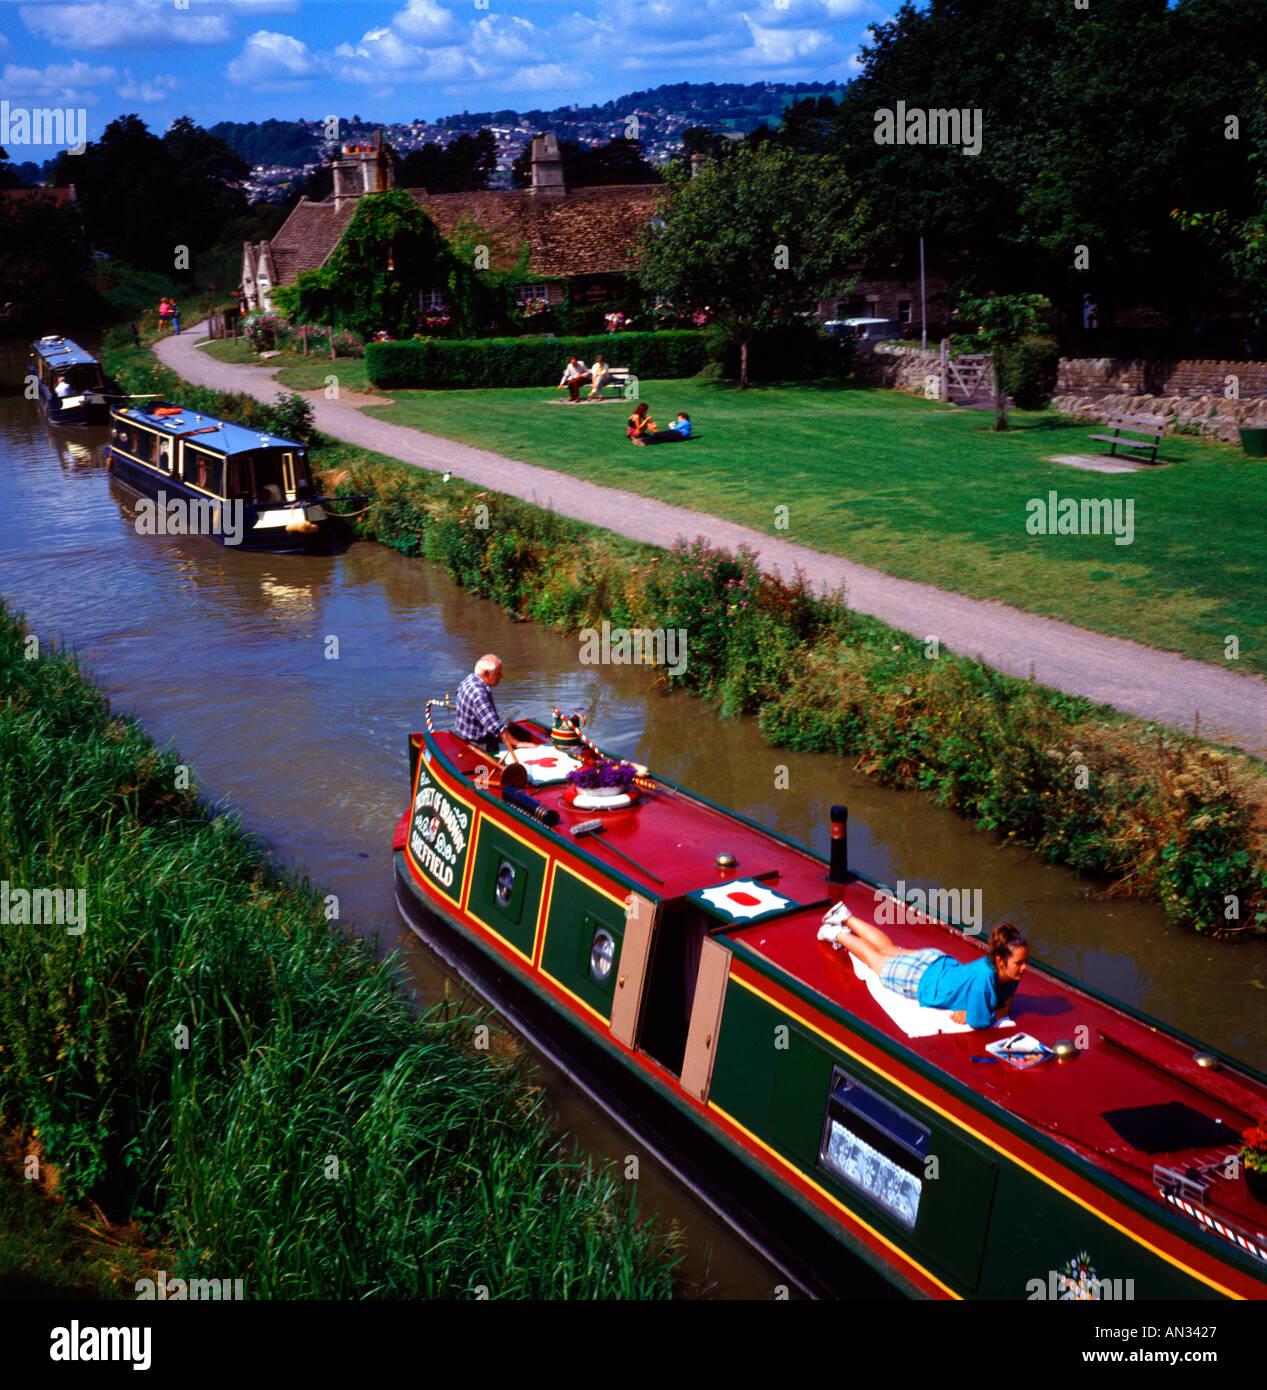 Leisure narrow boats Kennet and Avon canal Bathampton Somerset England - Stock Image